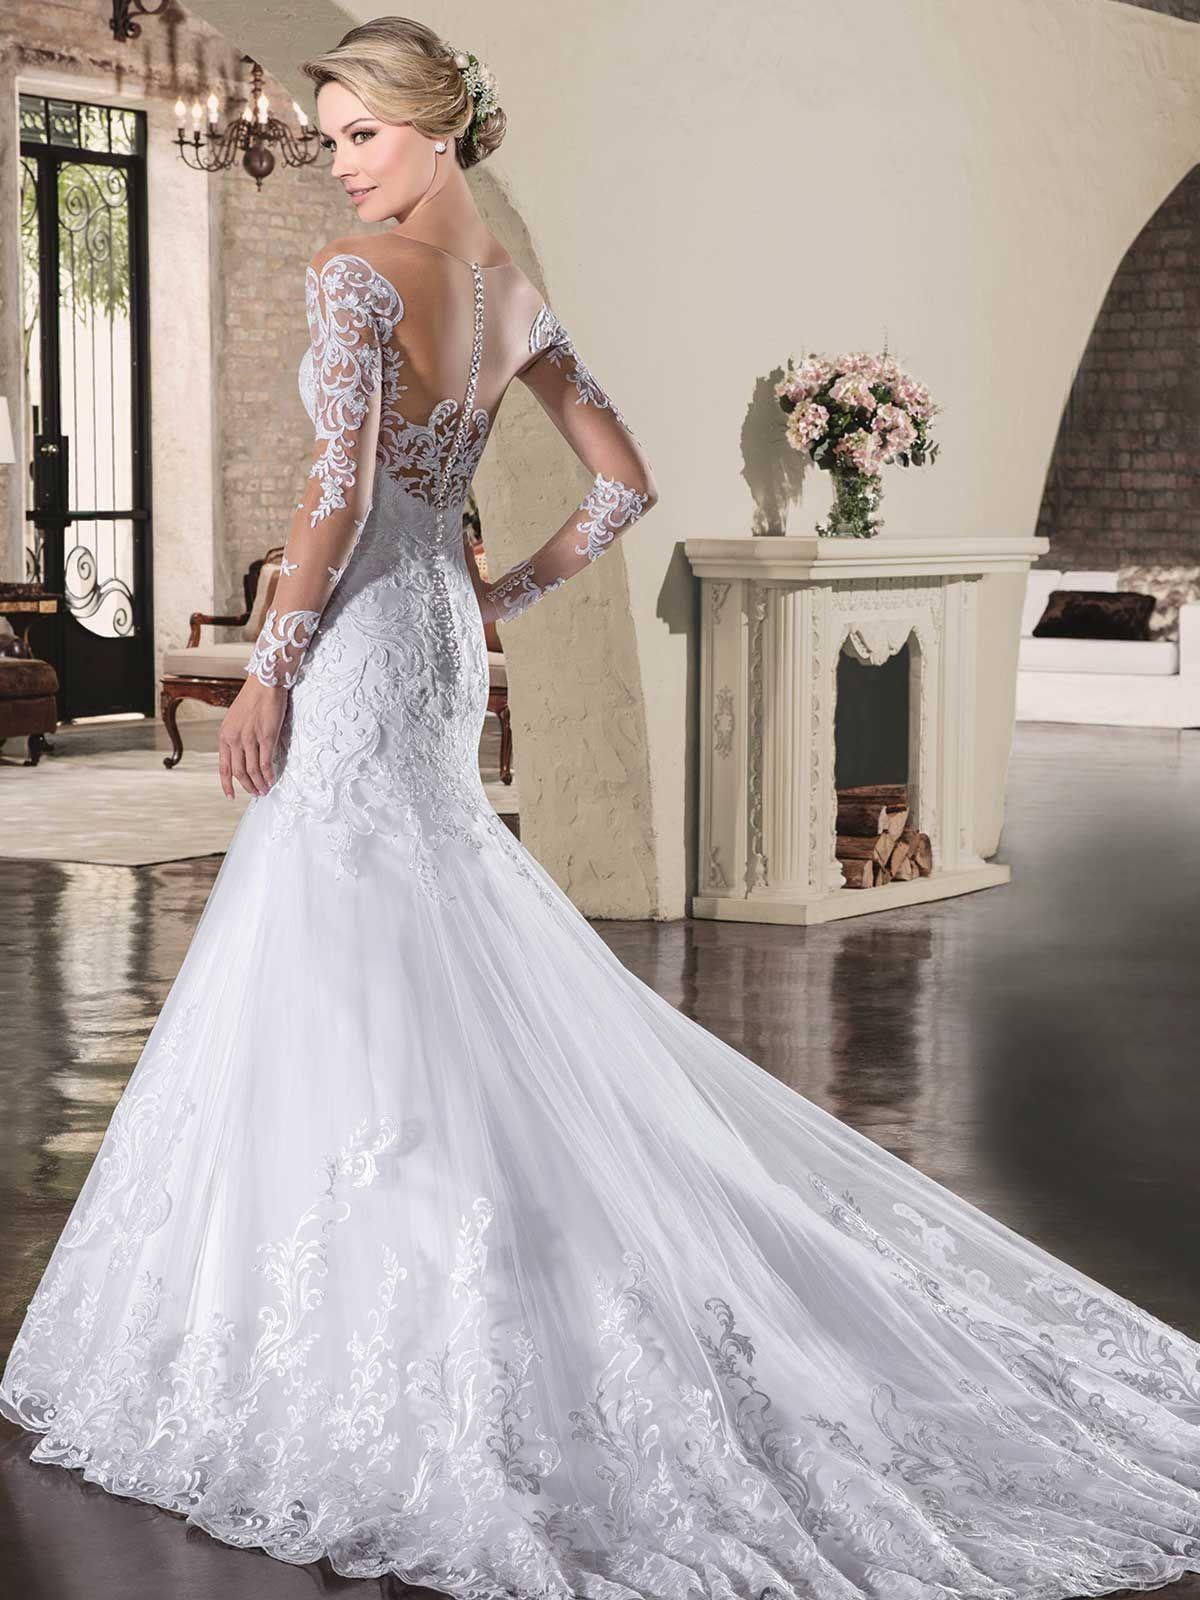 Dallas 11 - #vestidosdenoiva #noiva #bride #weddingdress #casamento ...